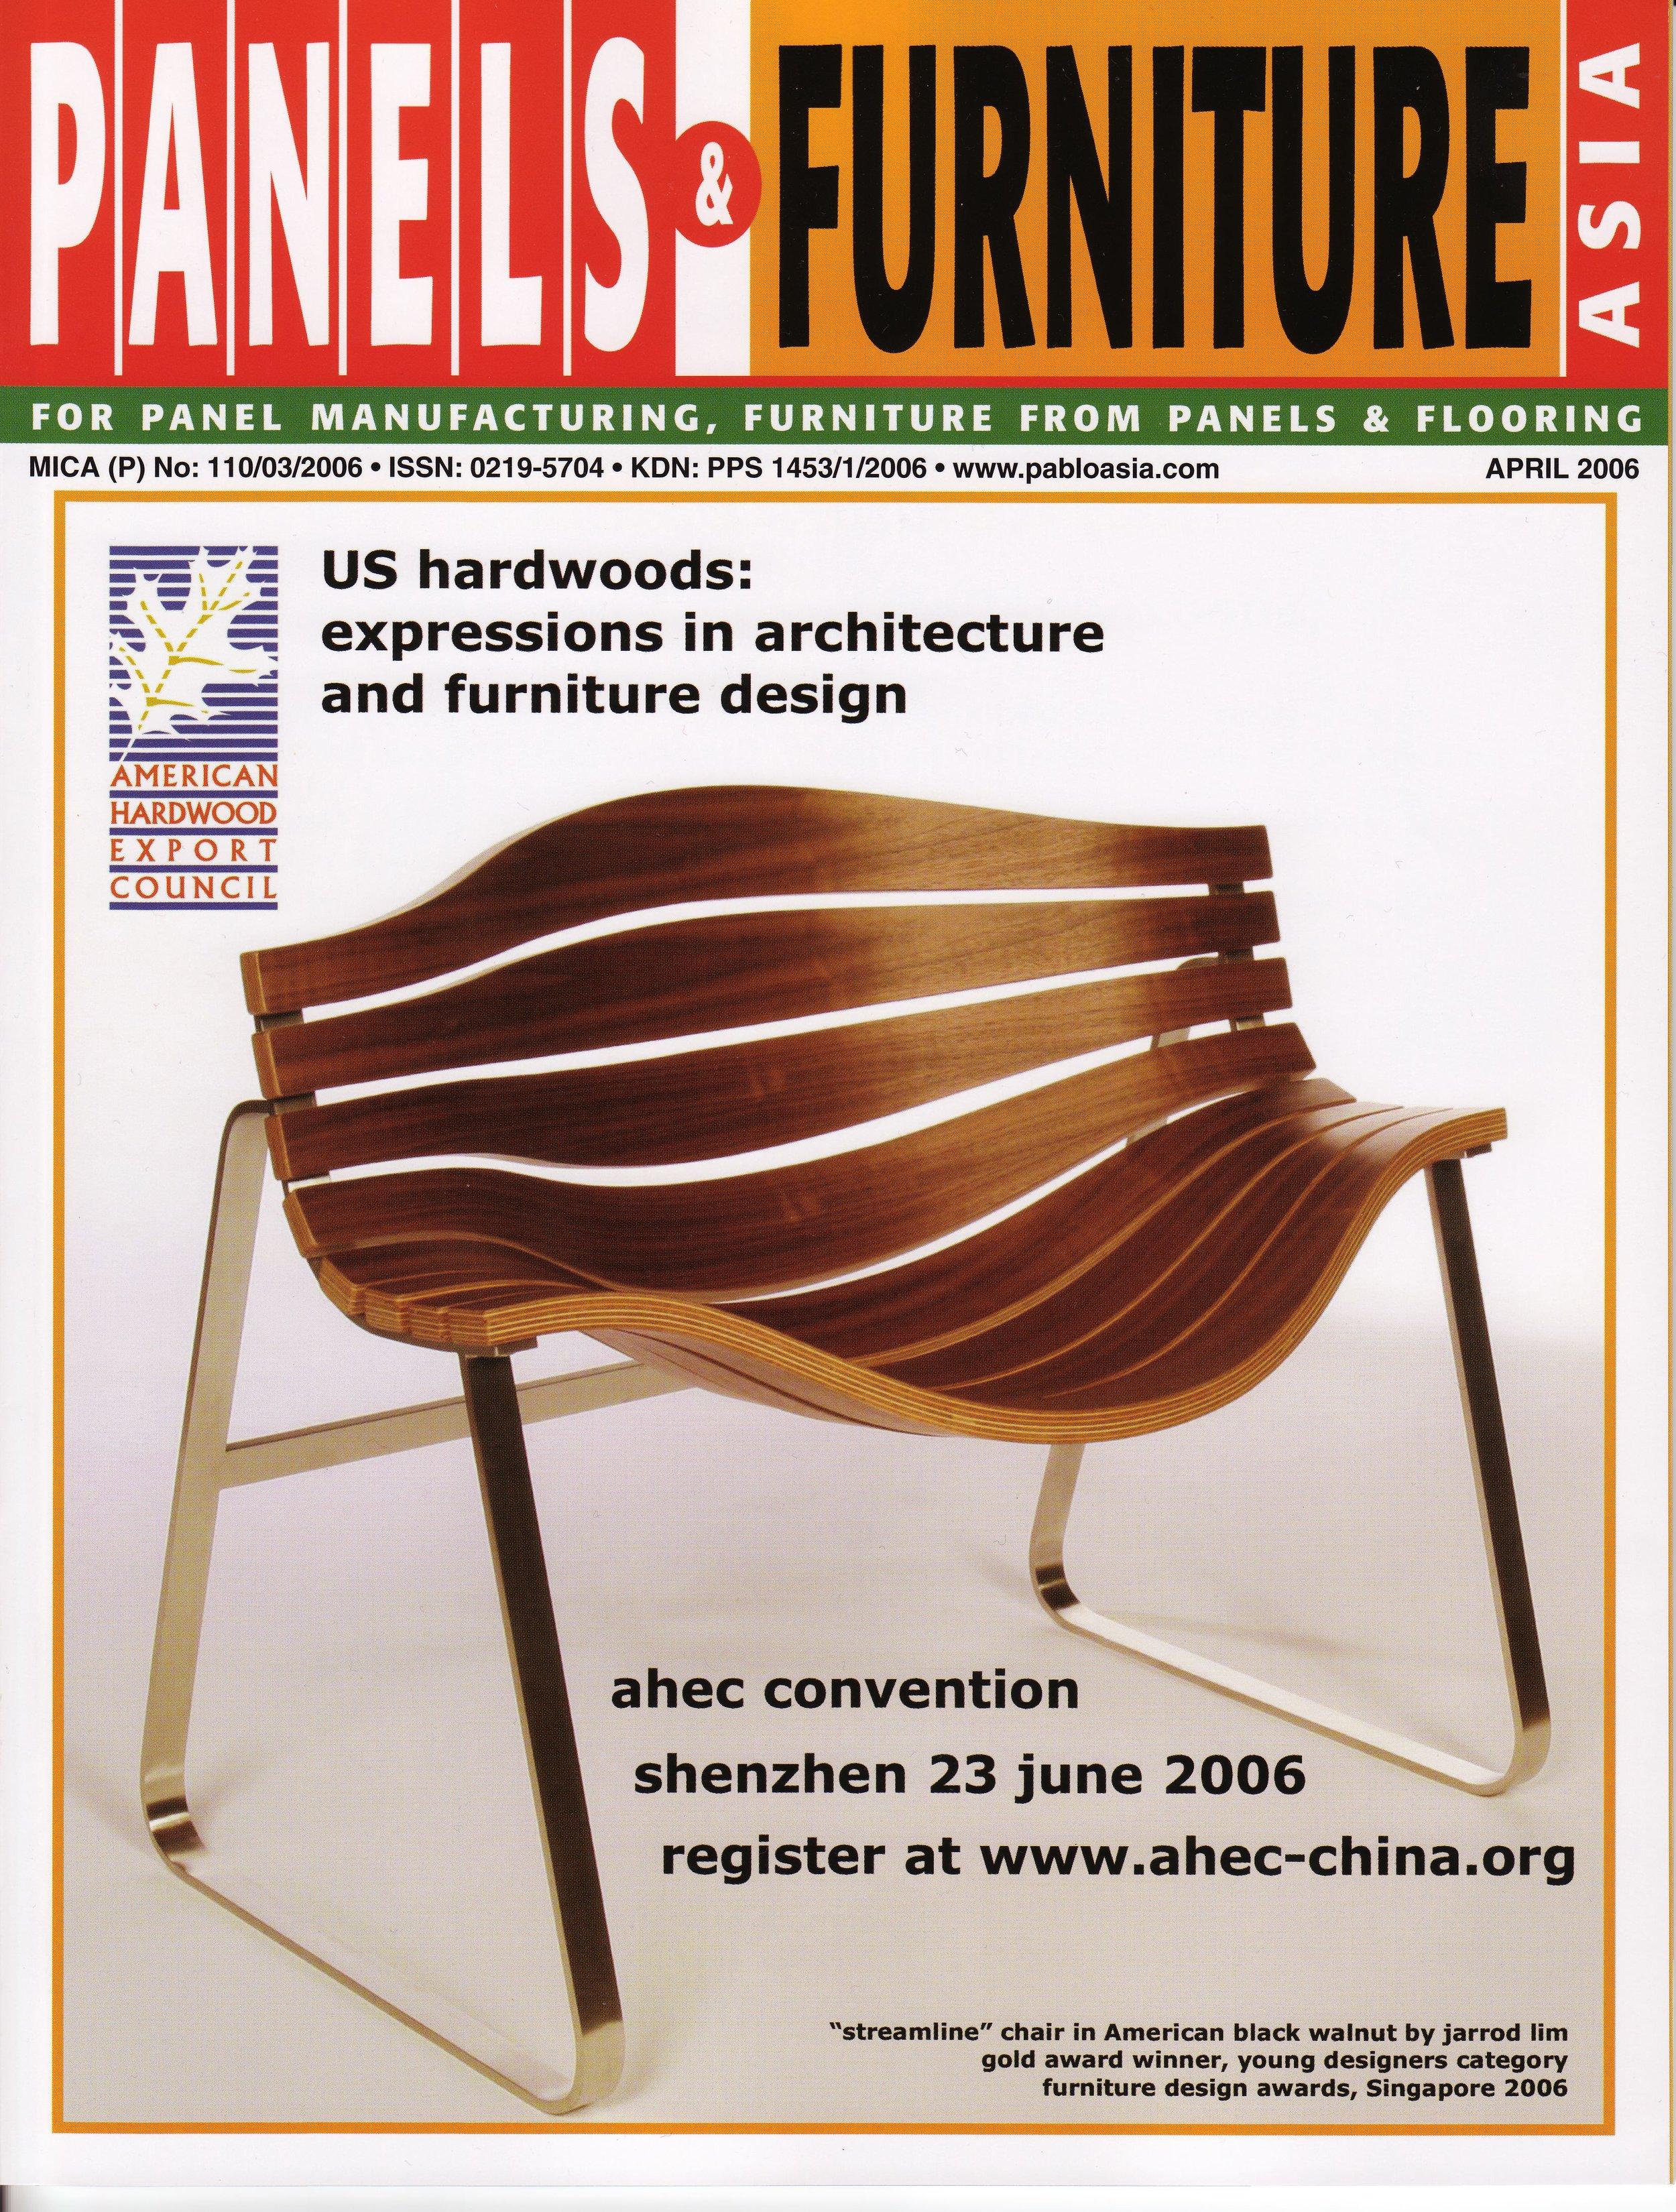 Panels & Furniture